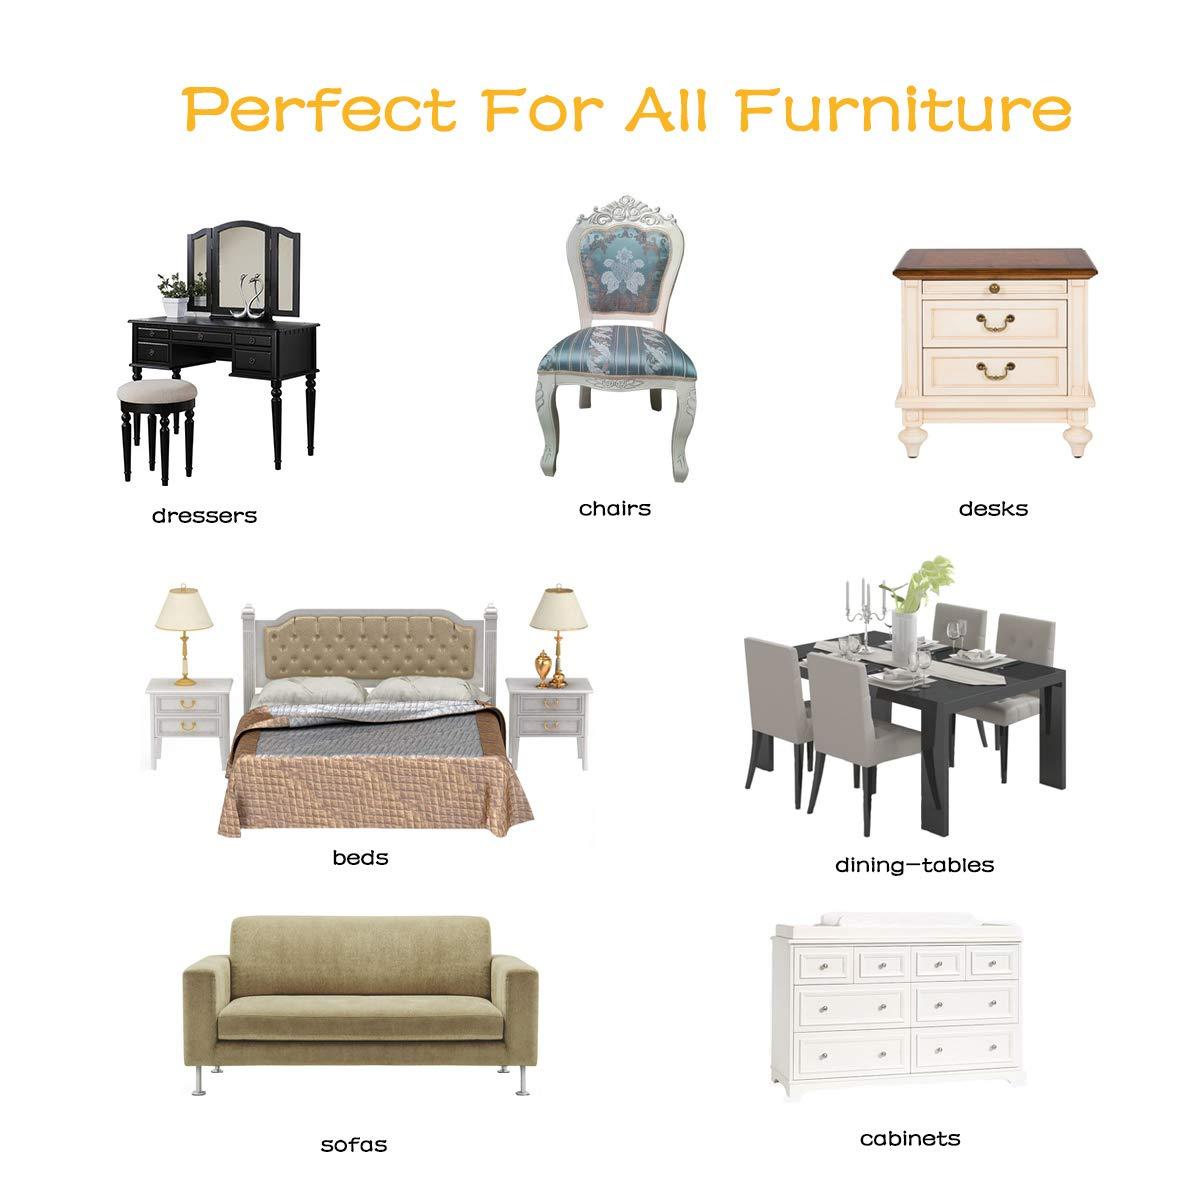 Lexsong Furniture Sliders (20 Piece), Reusable Felt Furniture Pads 3.5 inch Furniture Moving Kit Suitable for Carpet and Hard Floor